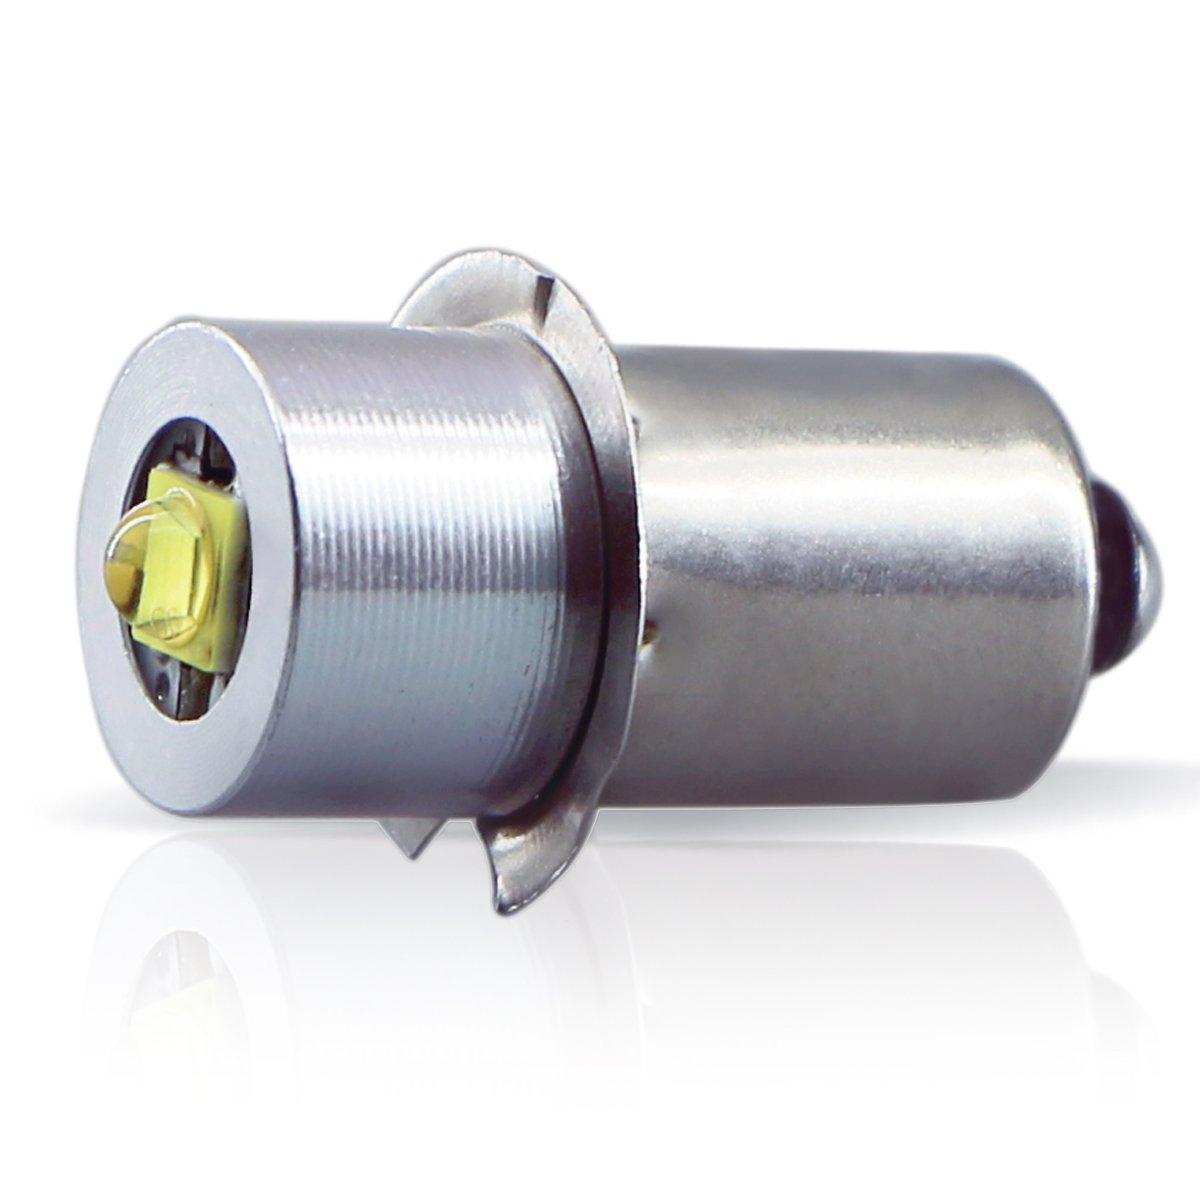 LudoPam Upgrade Replacement Conversion Flashlights